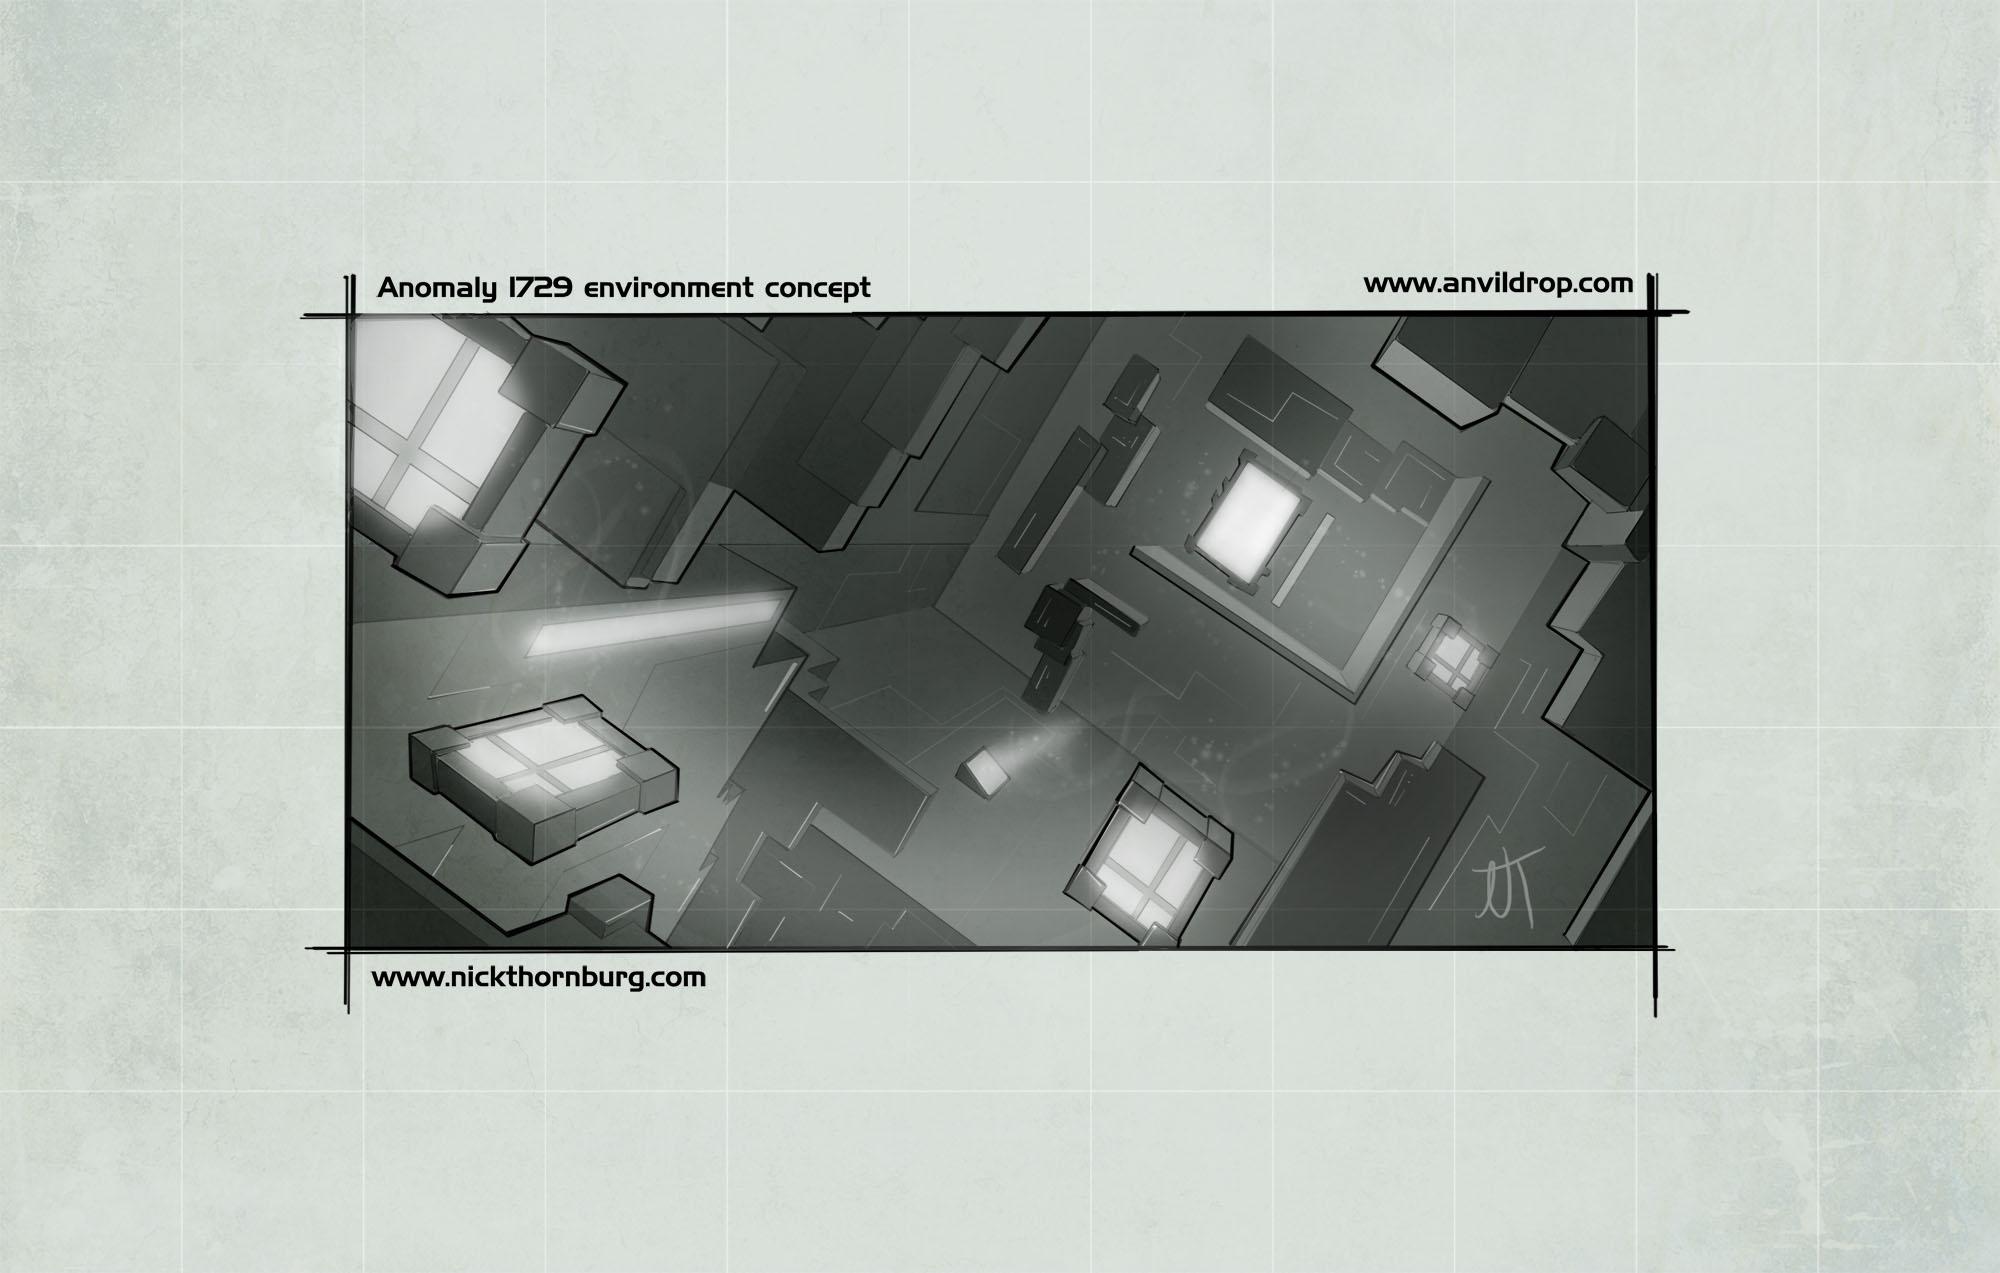 Anomaly 1729 Concept Art